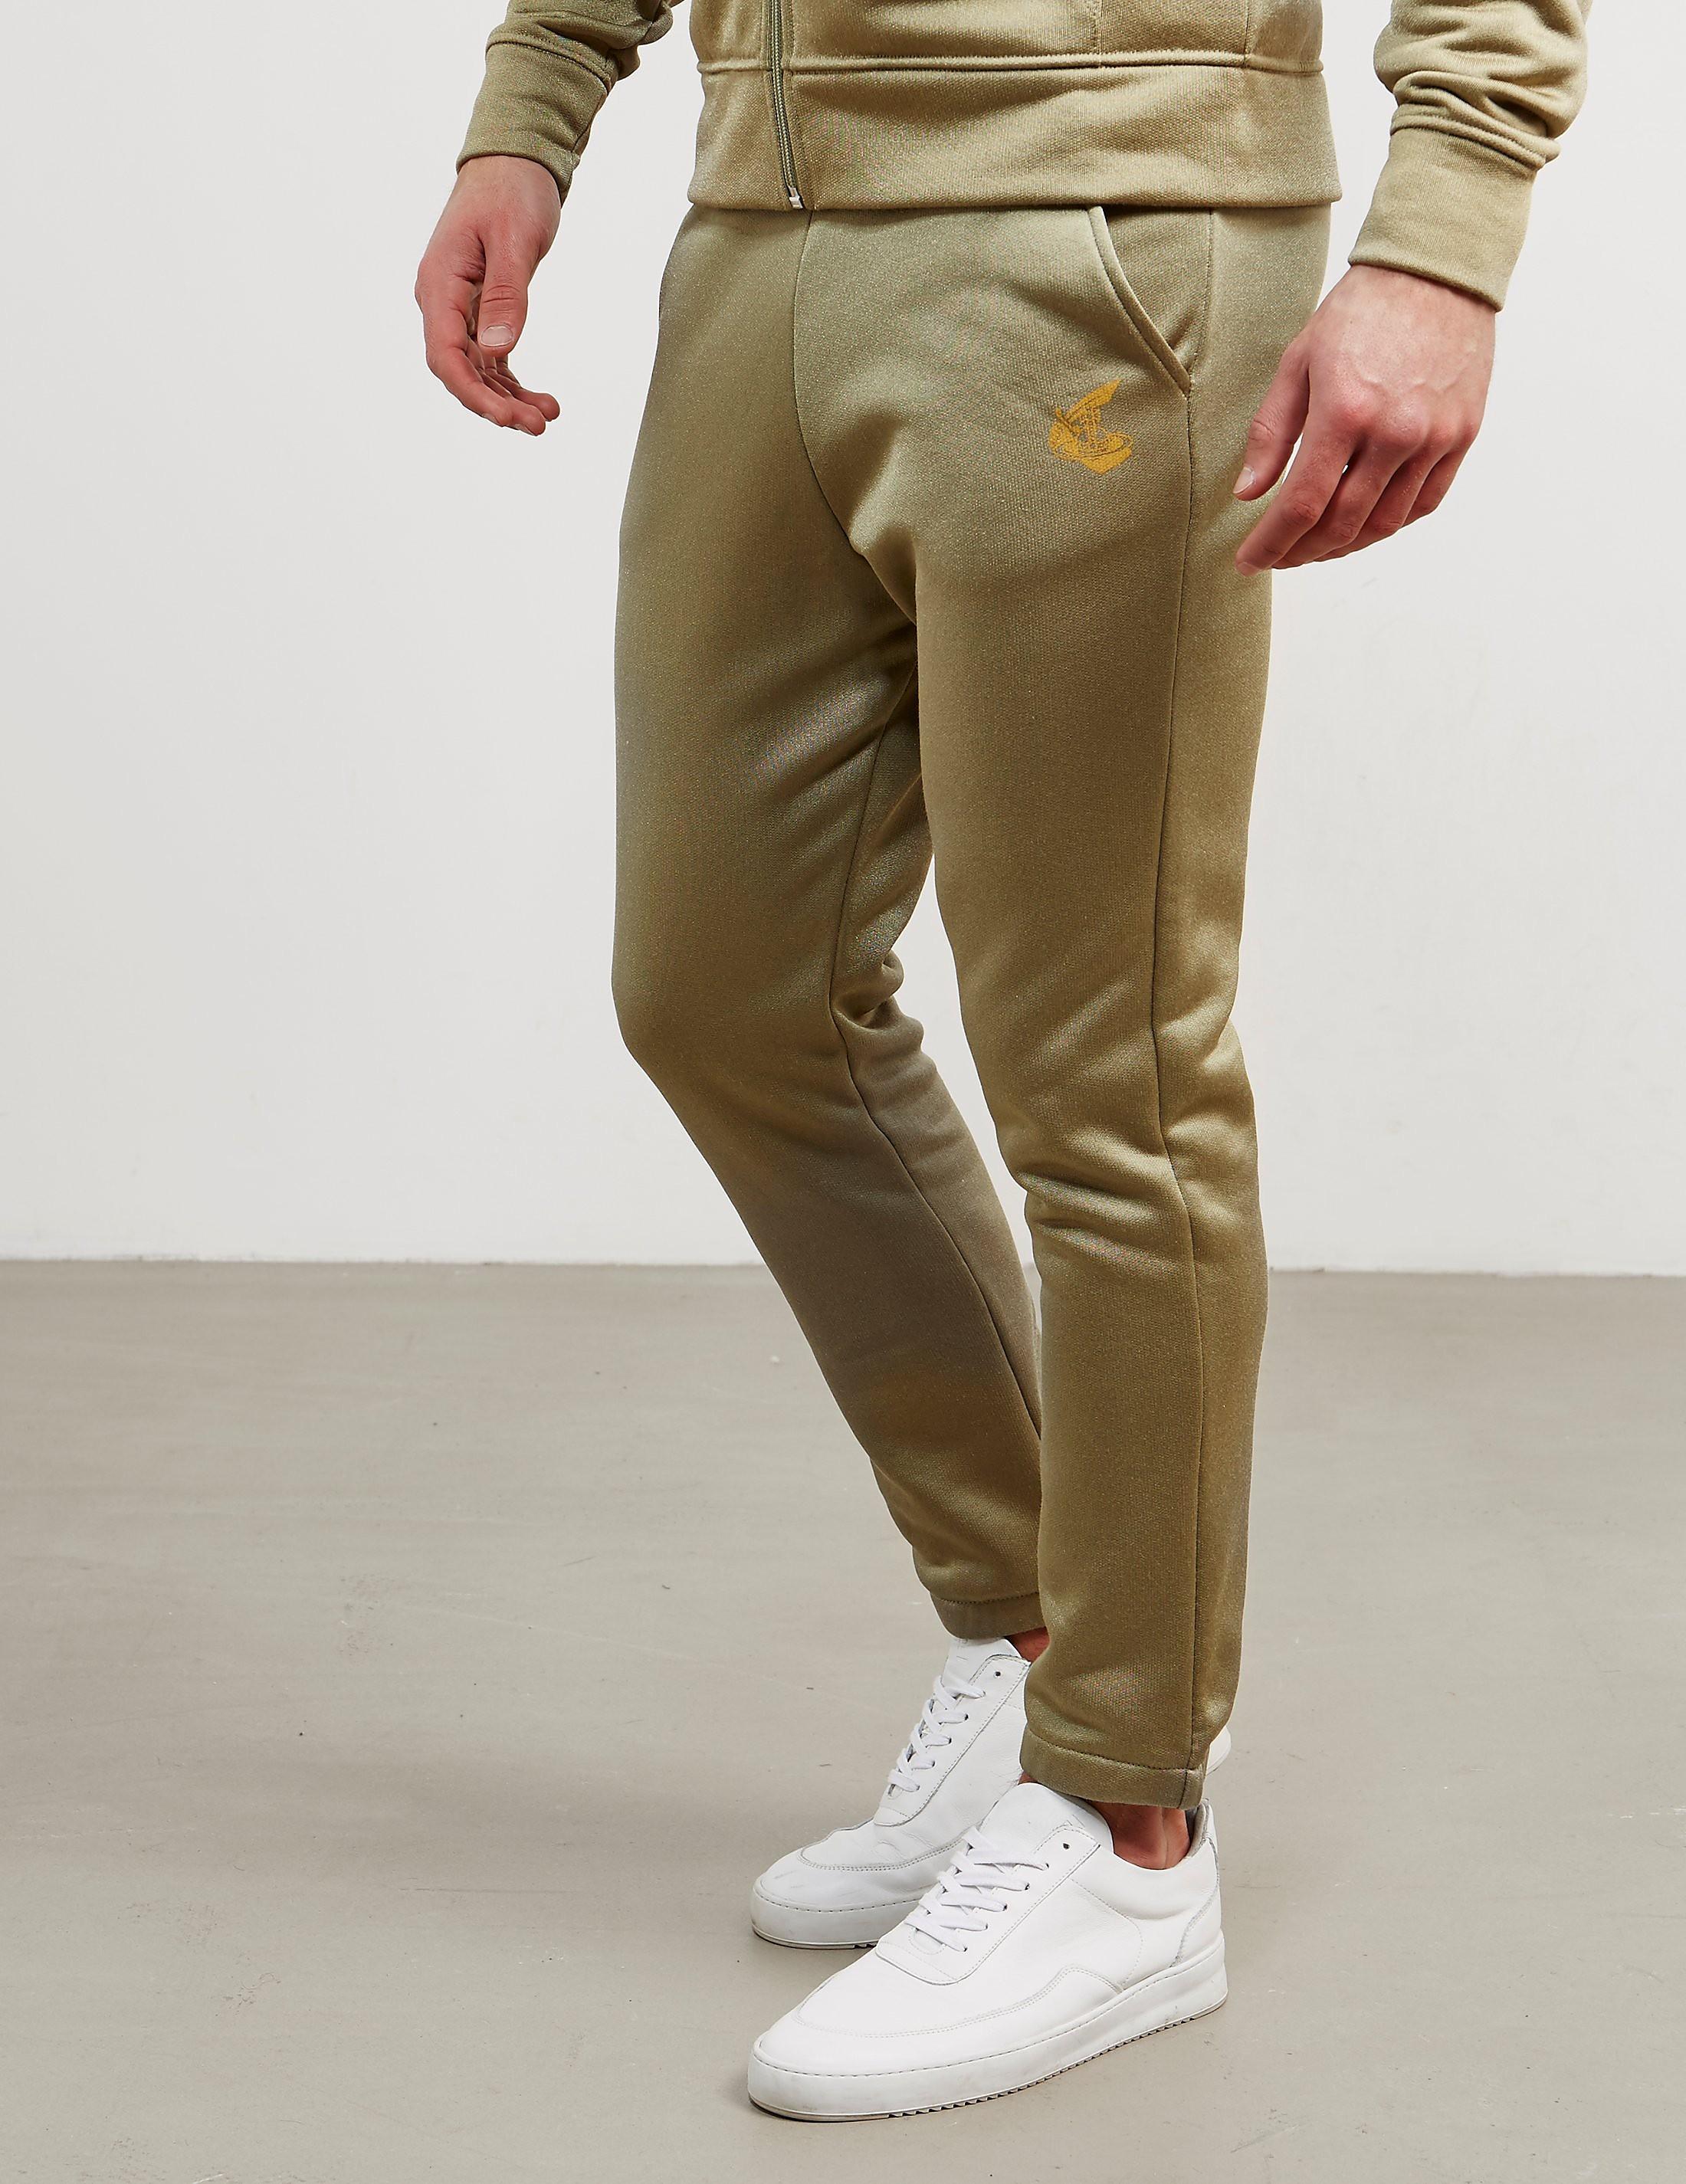 Vivienne Westwood Anglomania Track Pants